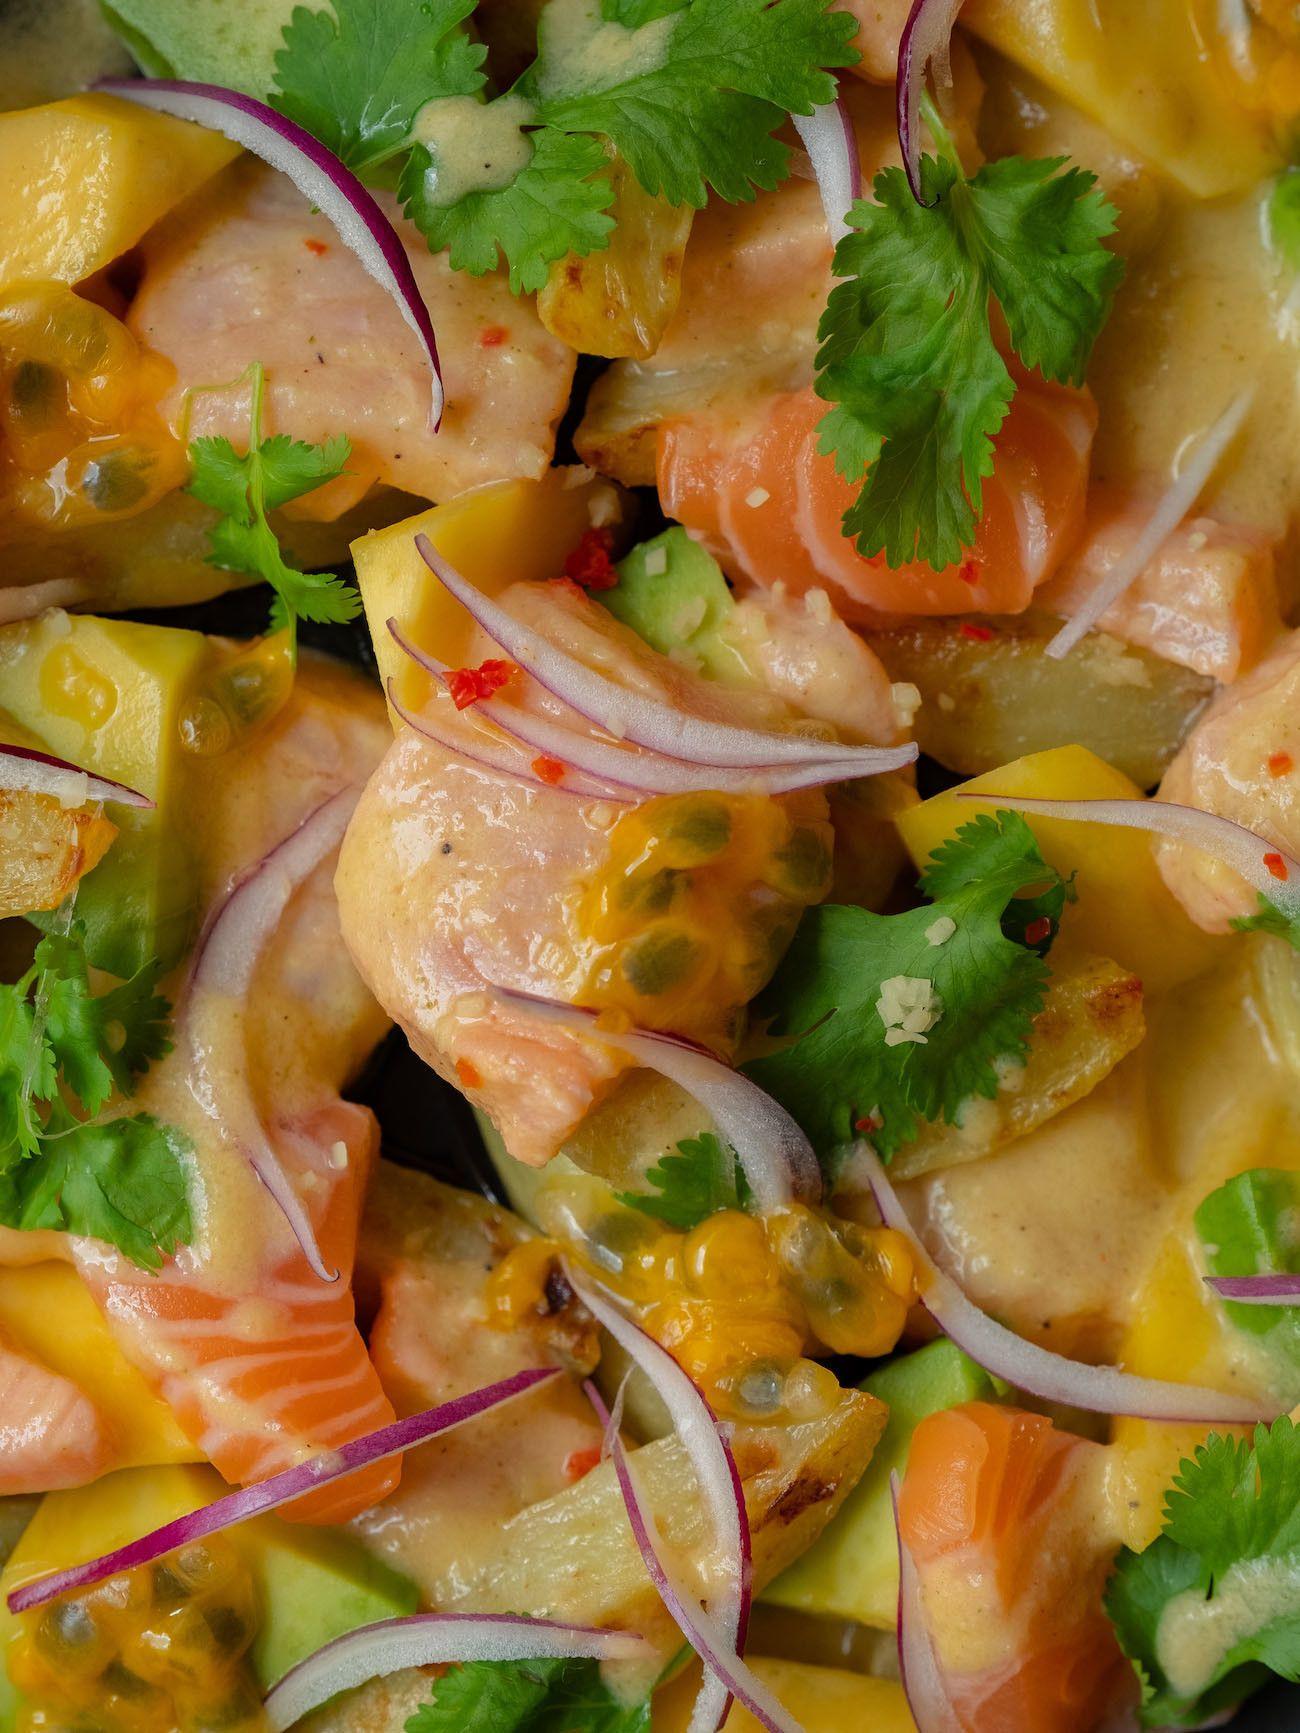 Foodblog, About Fuel, CEVICHE Das Kochbuch, Juan Danilo, Habanero, rote Zwiebeln, Ingwer, Koriander